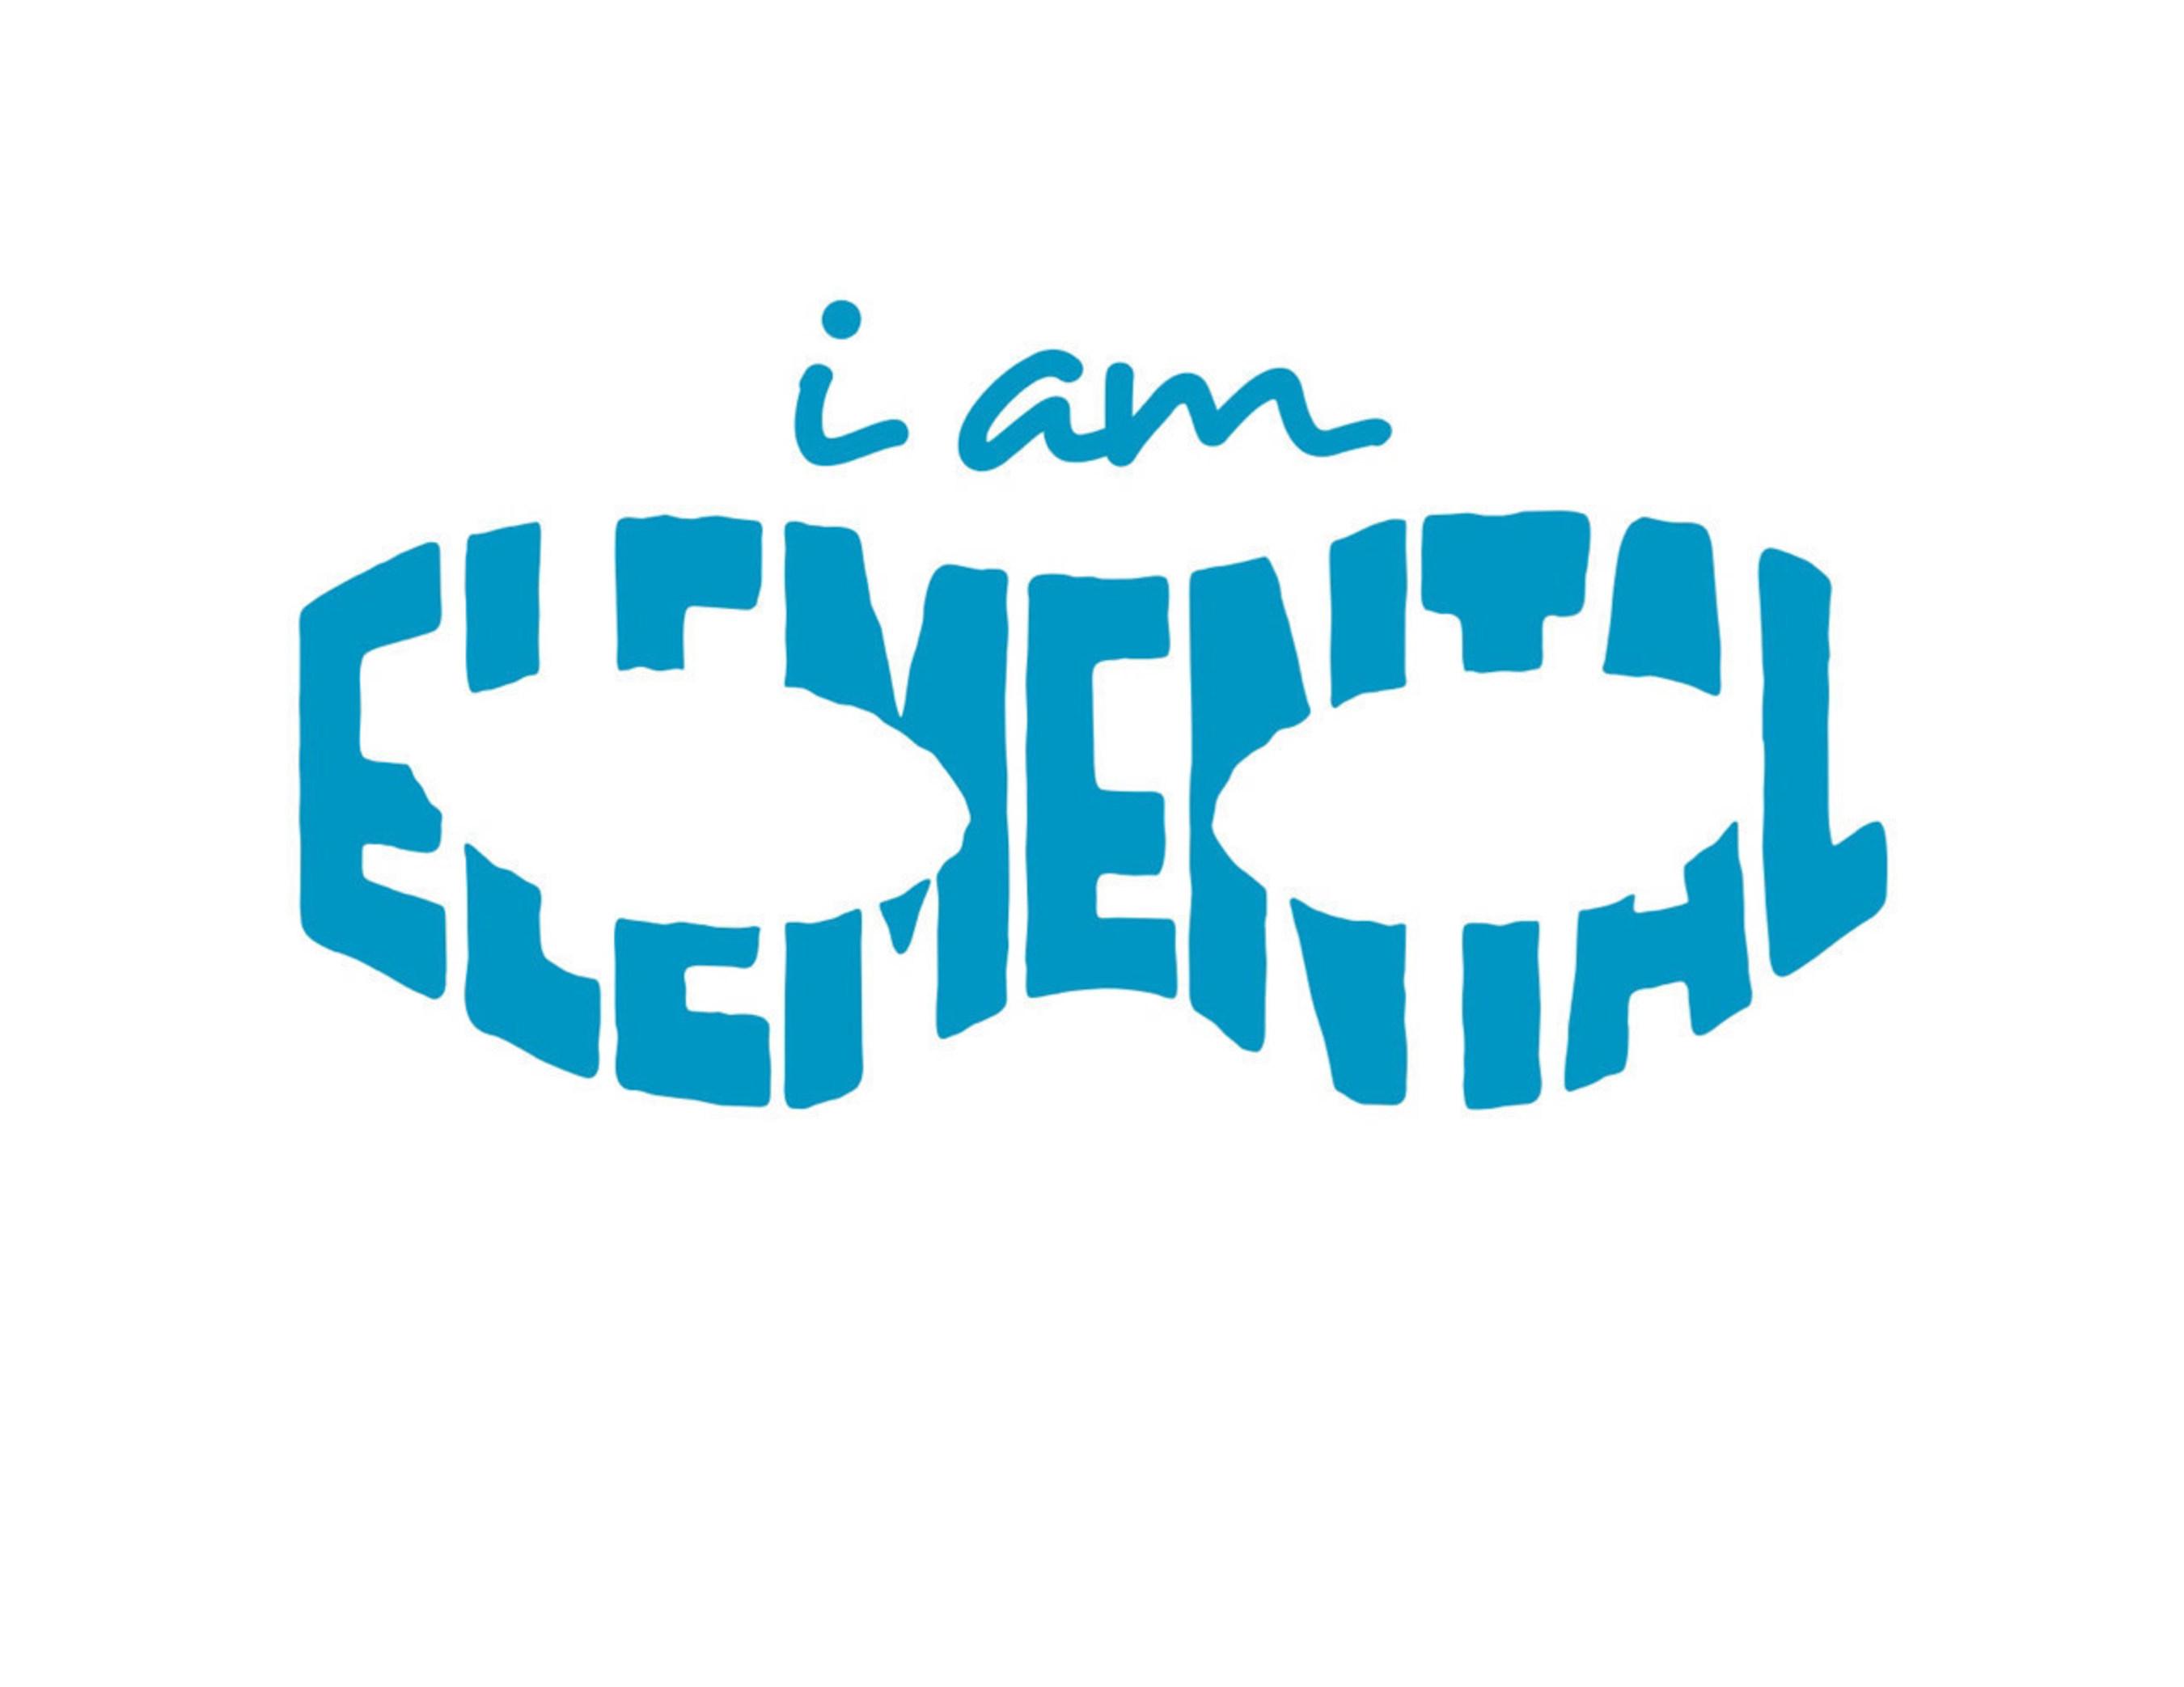 IAmElemental, creators of the first female superhero action figures designed specifically for children (PRNewsFoto/IAmElemental)